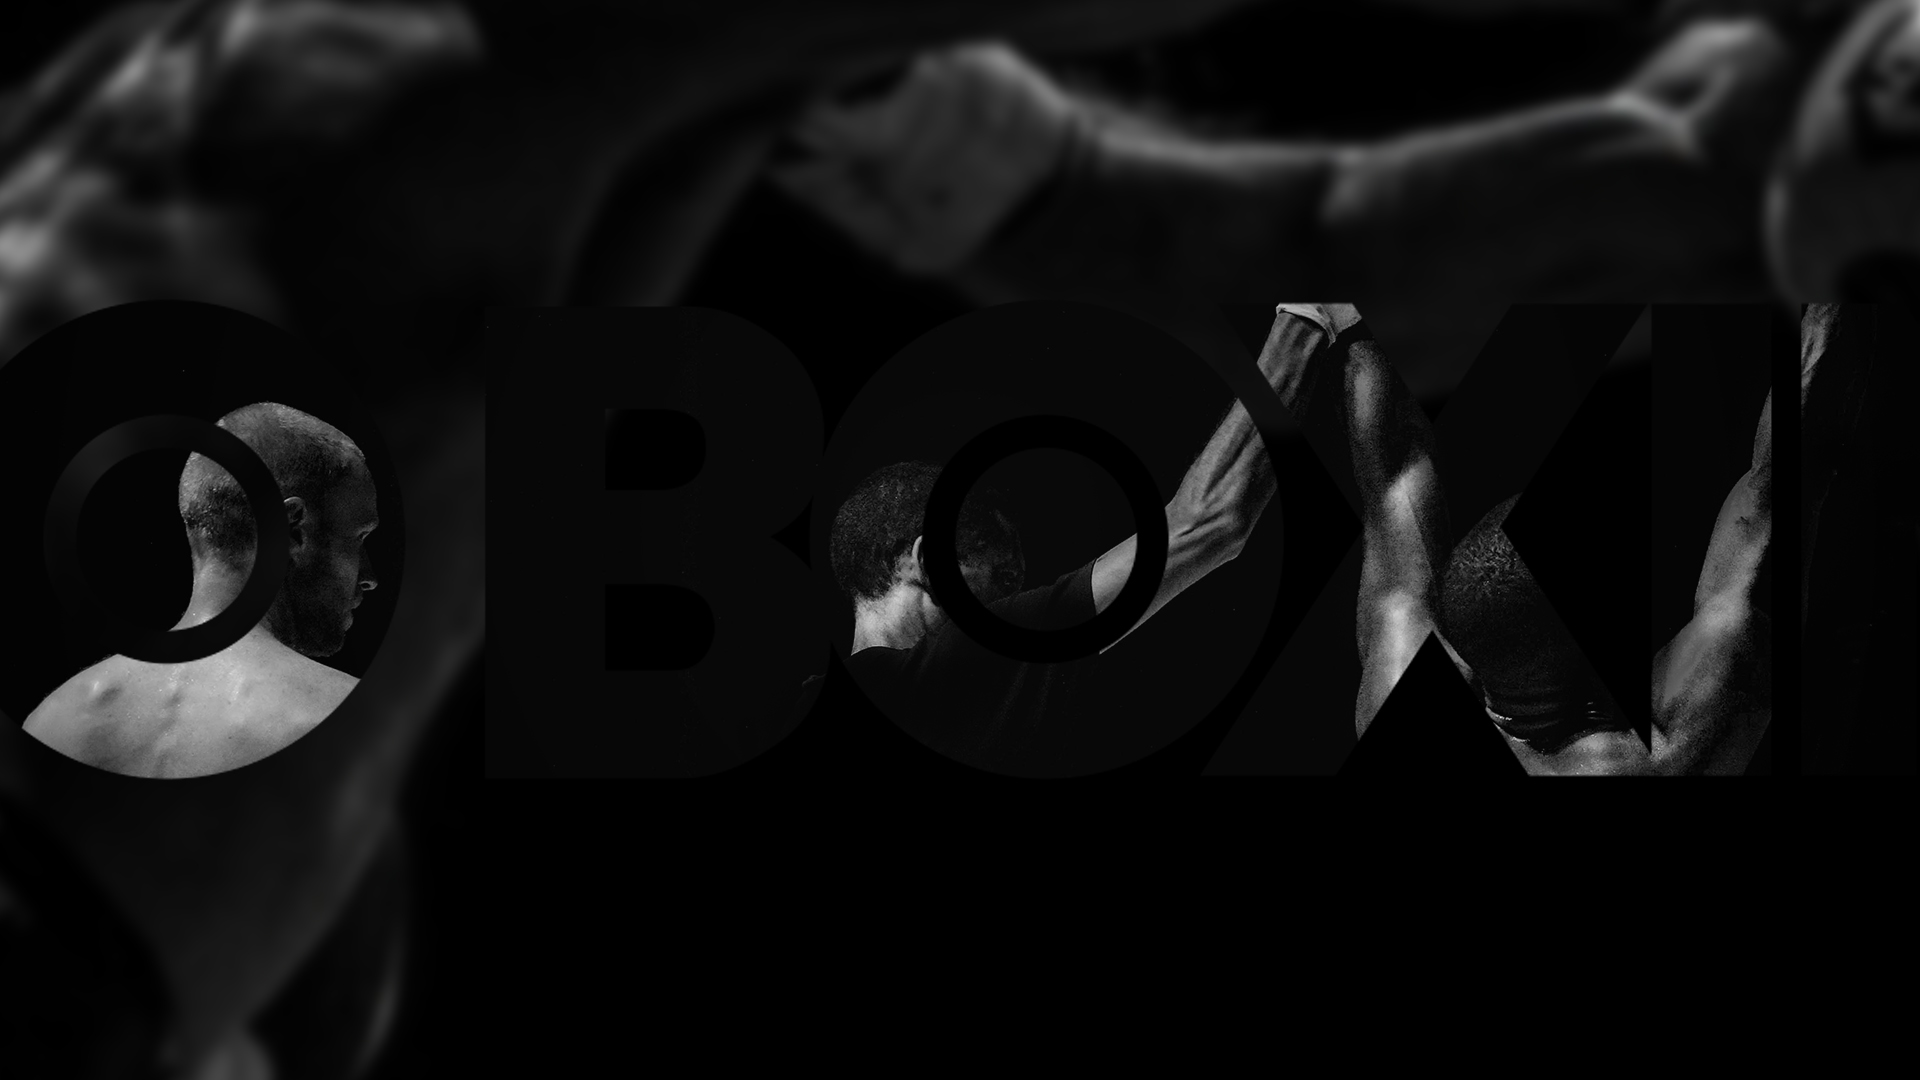 HBO_LOGO_RESOLVE_V3_2.jpg